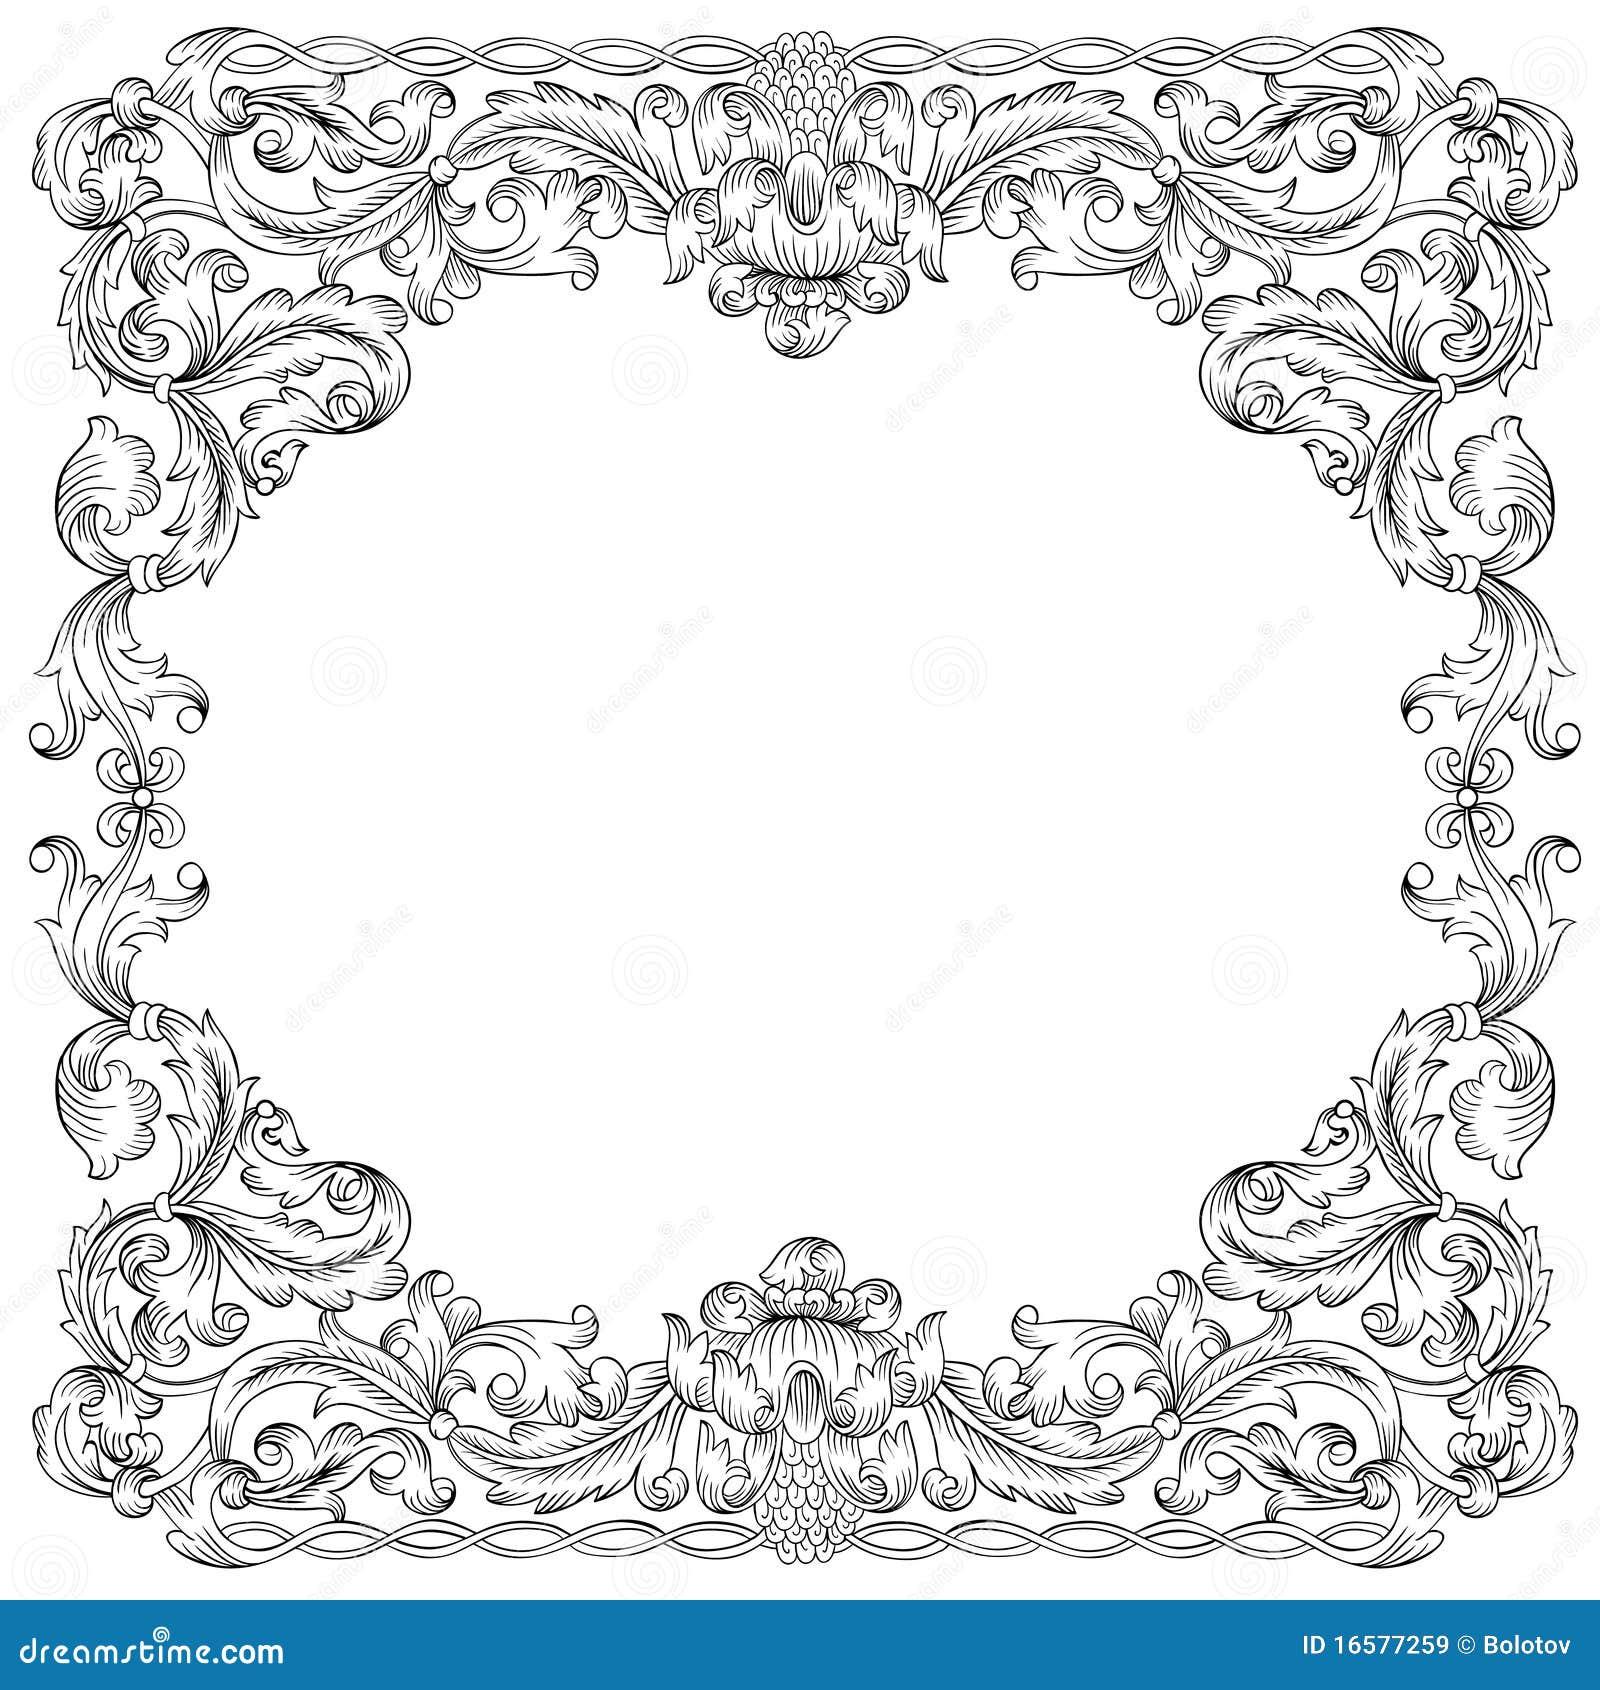 floral ornament frame simulates engraving